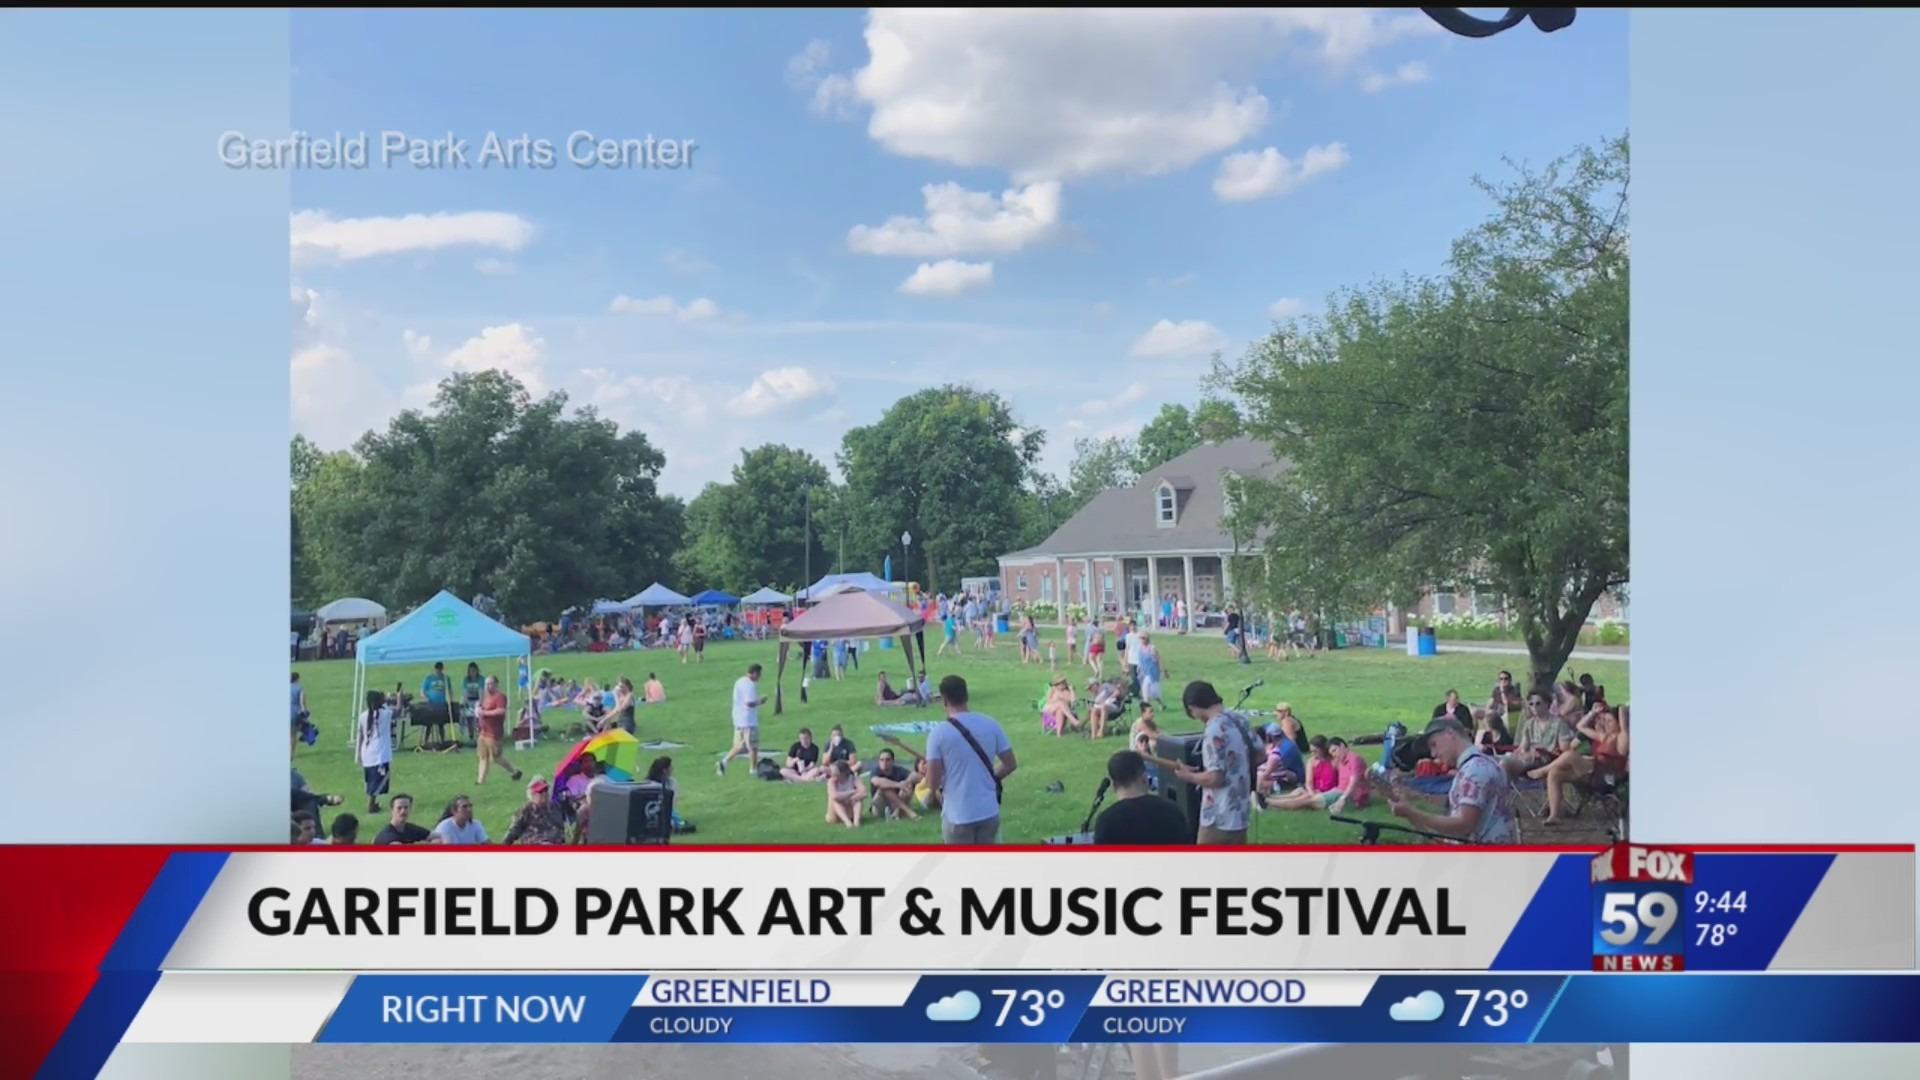 Garfield Park Festival